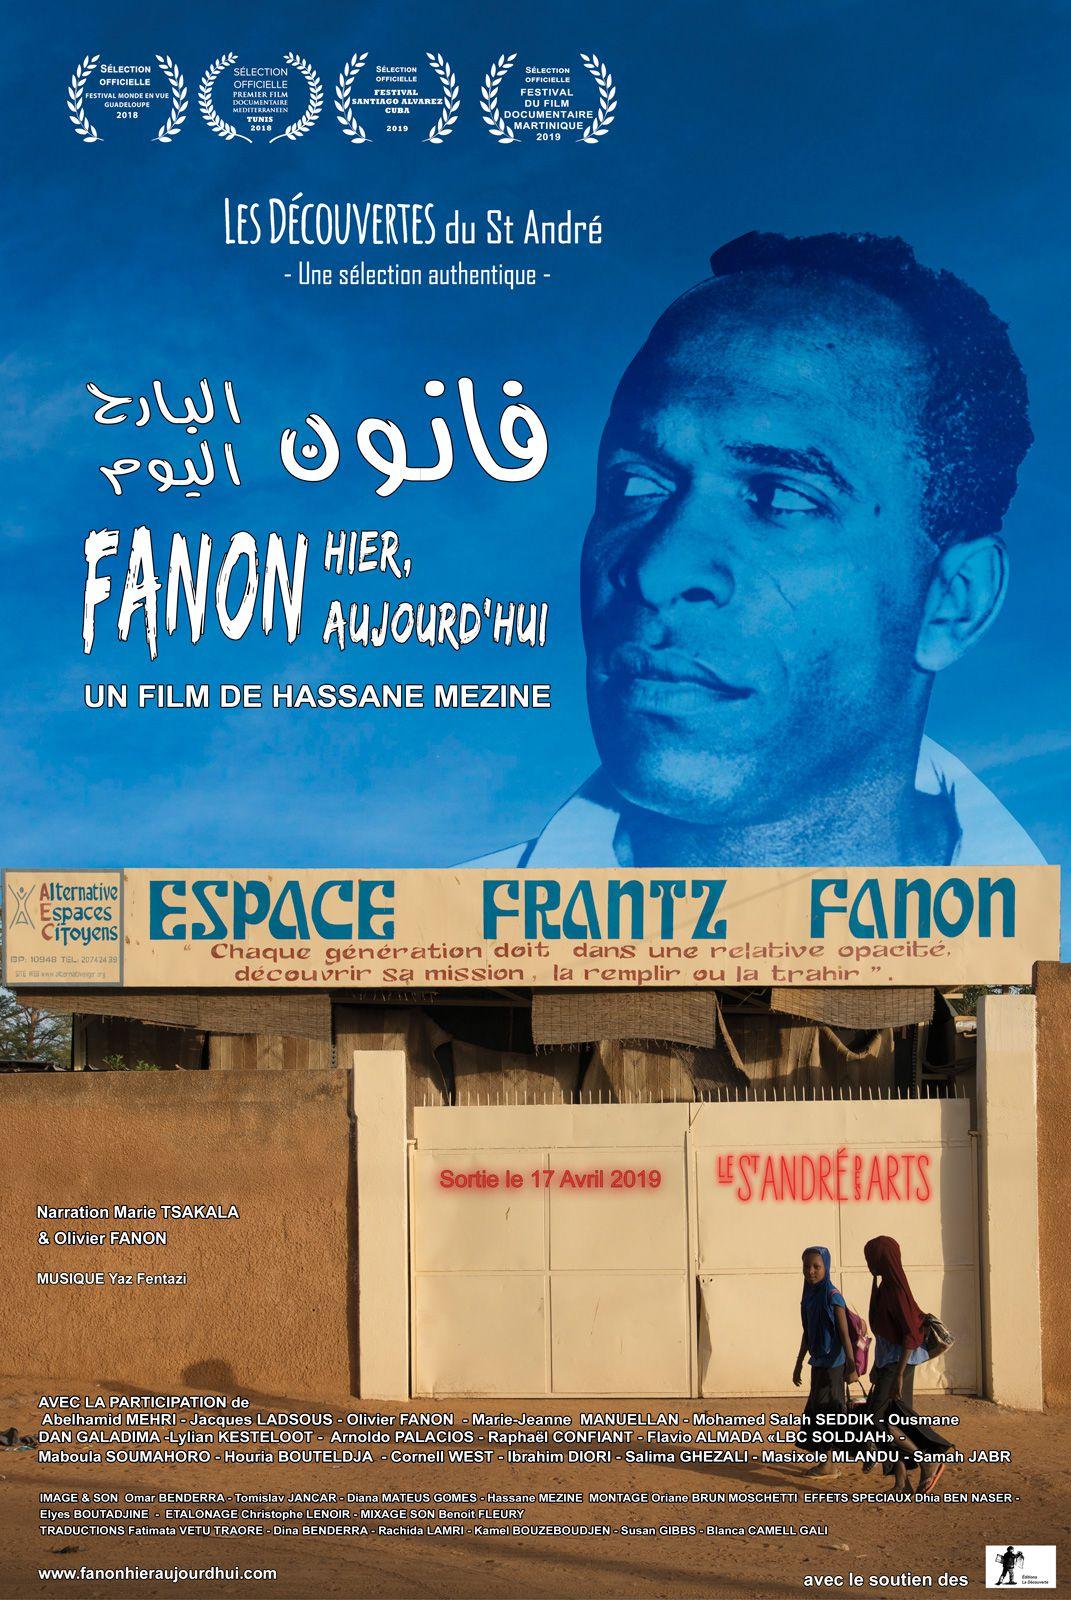 Fanon hier, aujourd'hui - Documentaire (2019)